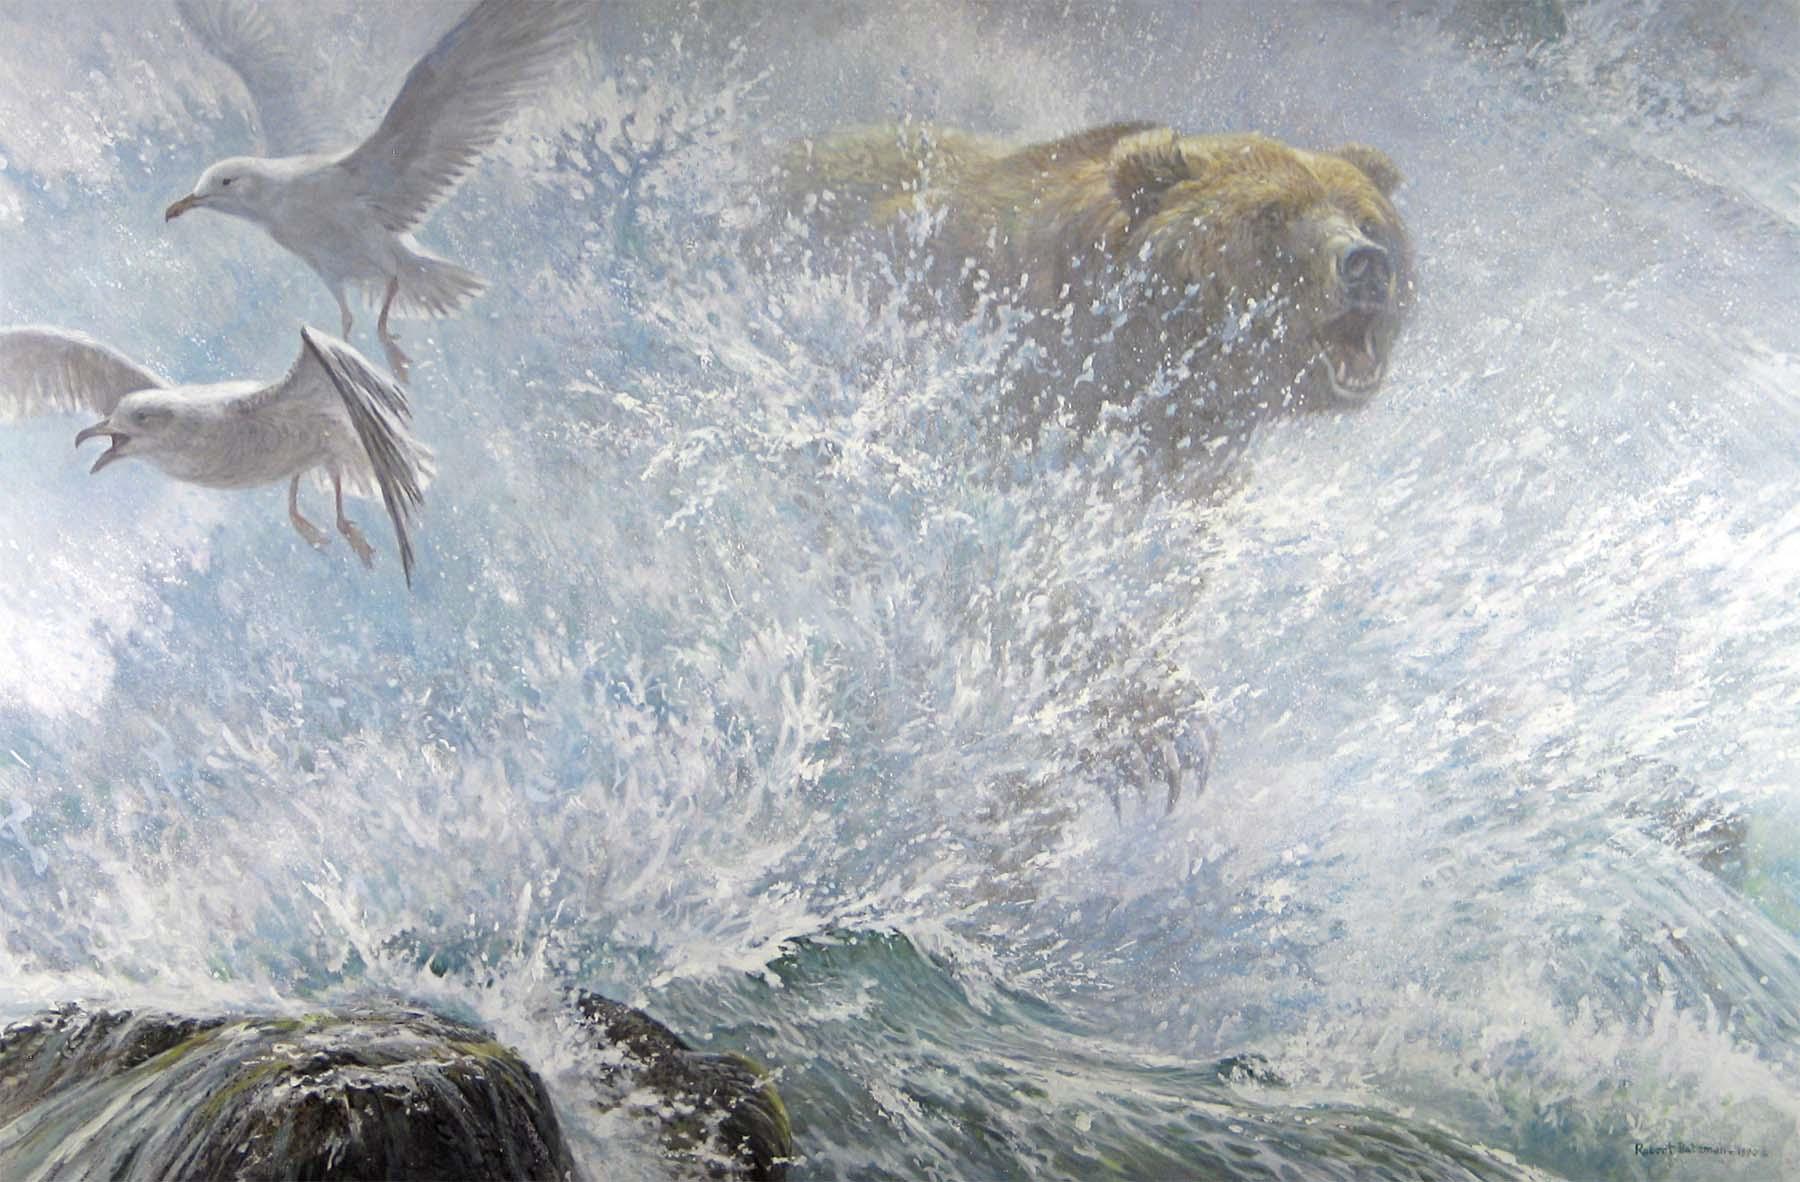 Endangered Spaces - Grizzly - Robert Bateman